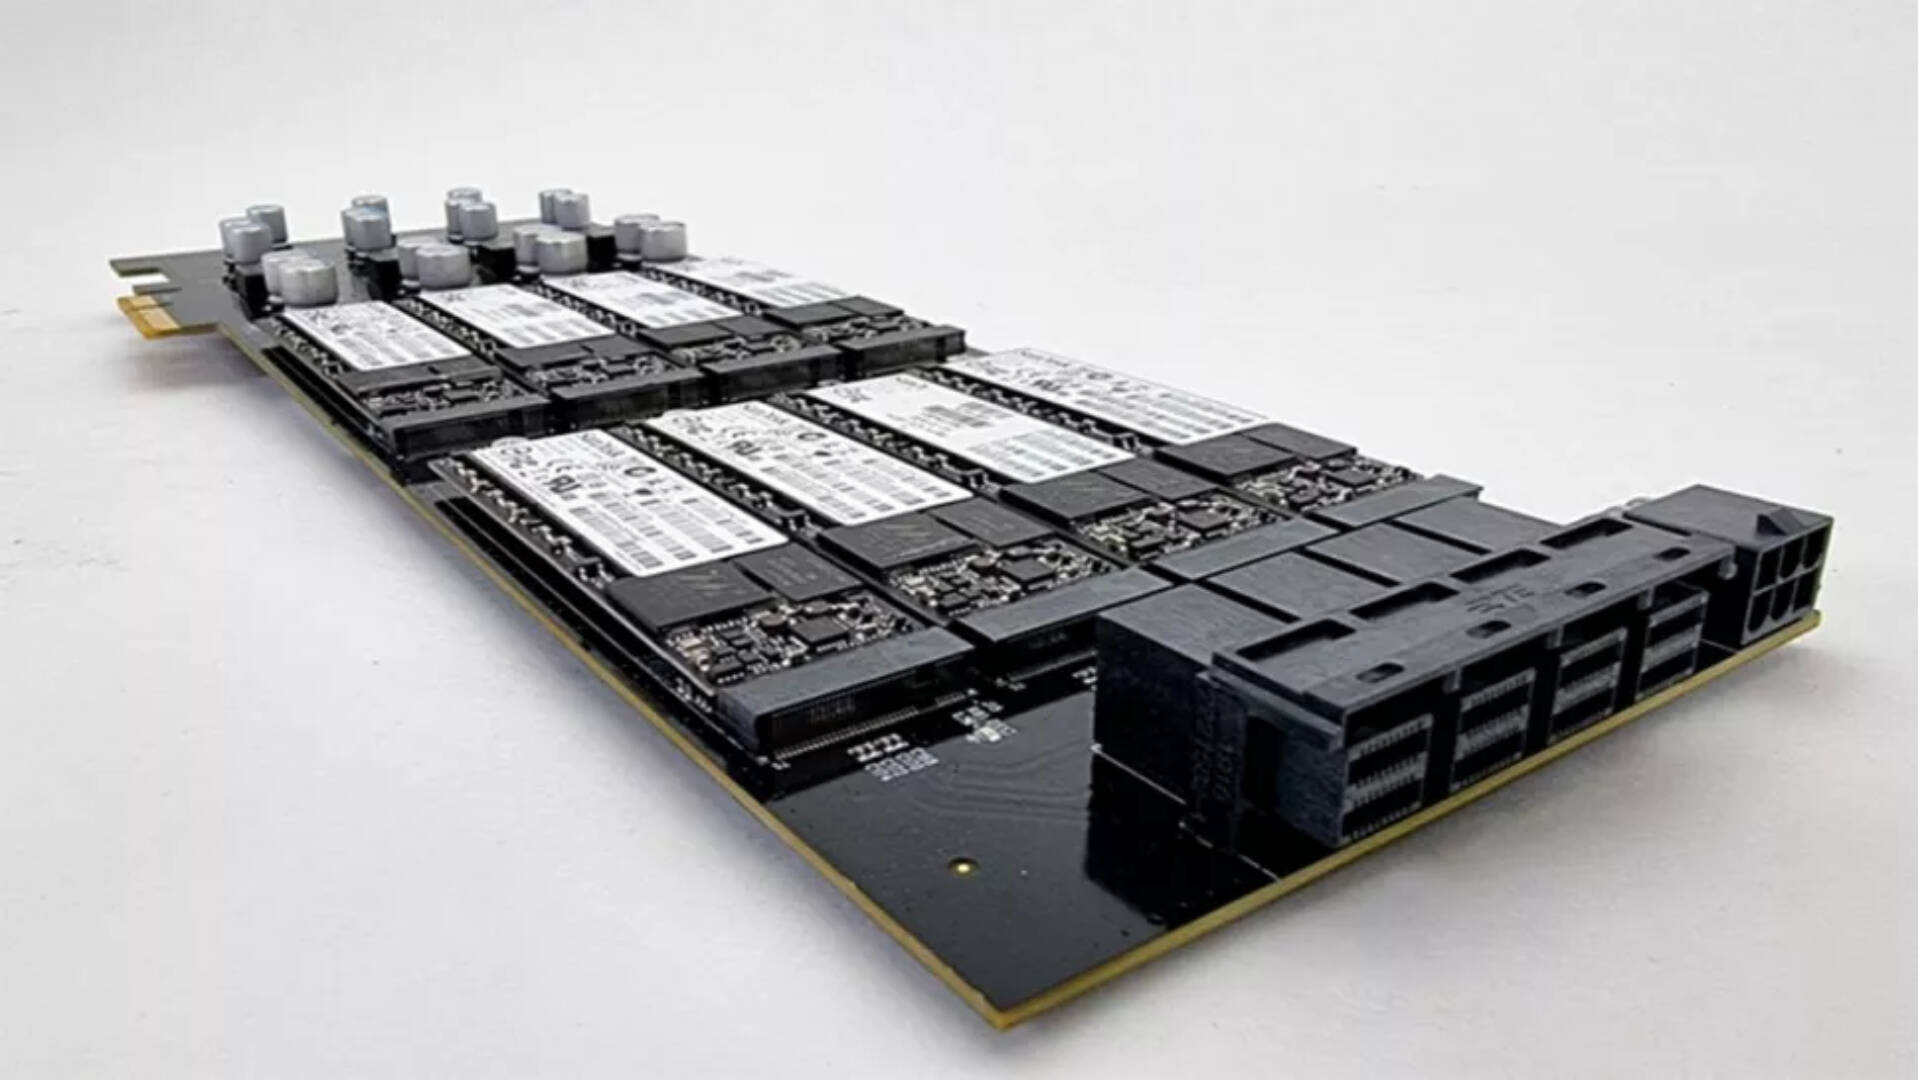 Apex Storage PCie 16 SSD